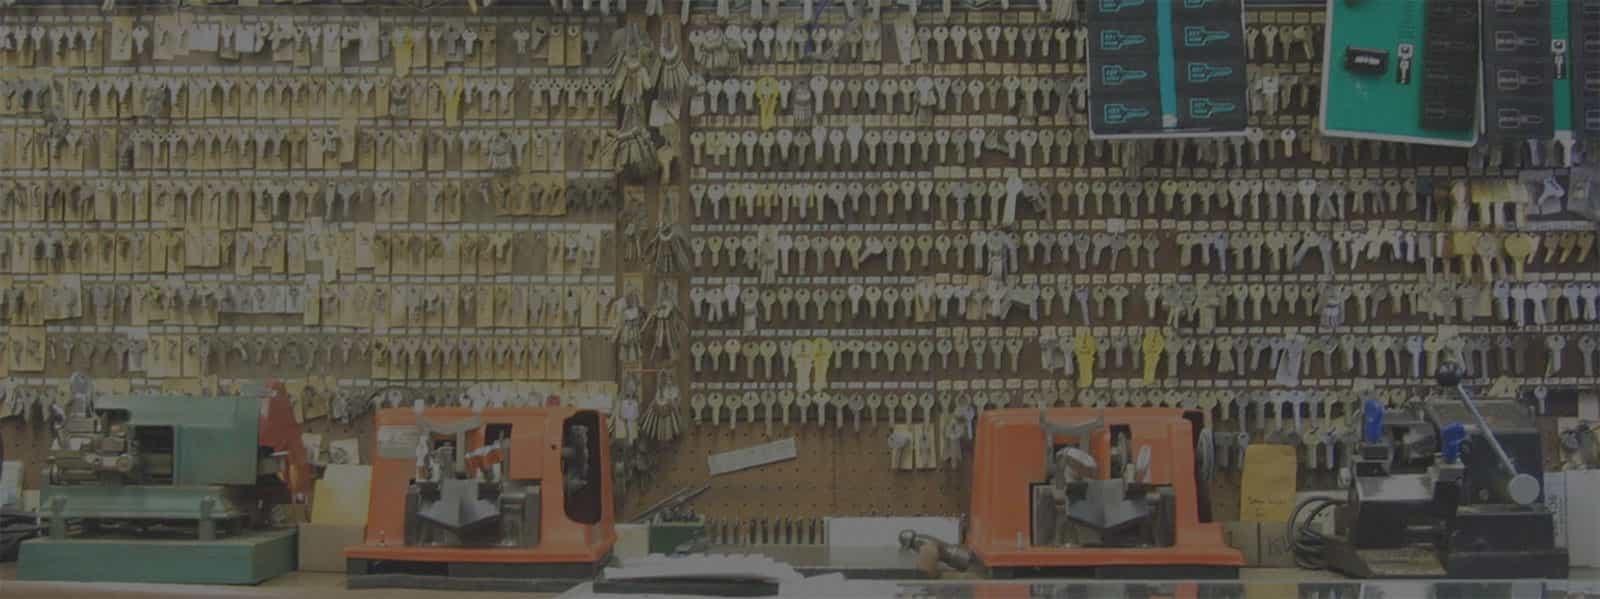 M&D Locks and Keys (@brooklynmanhattanlocksmiths) Cover Image